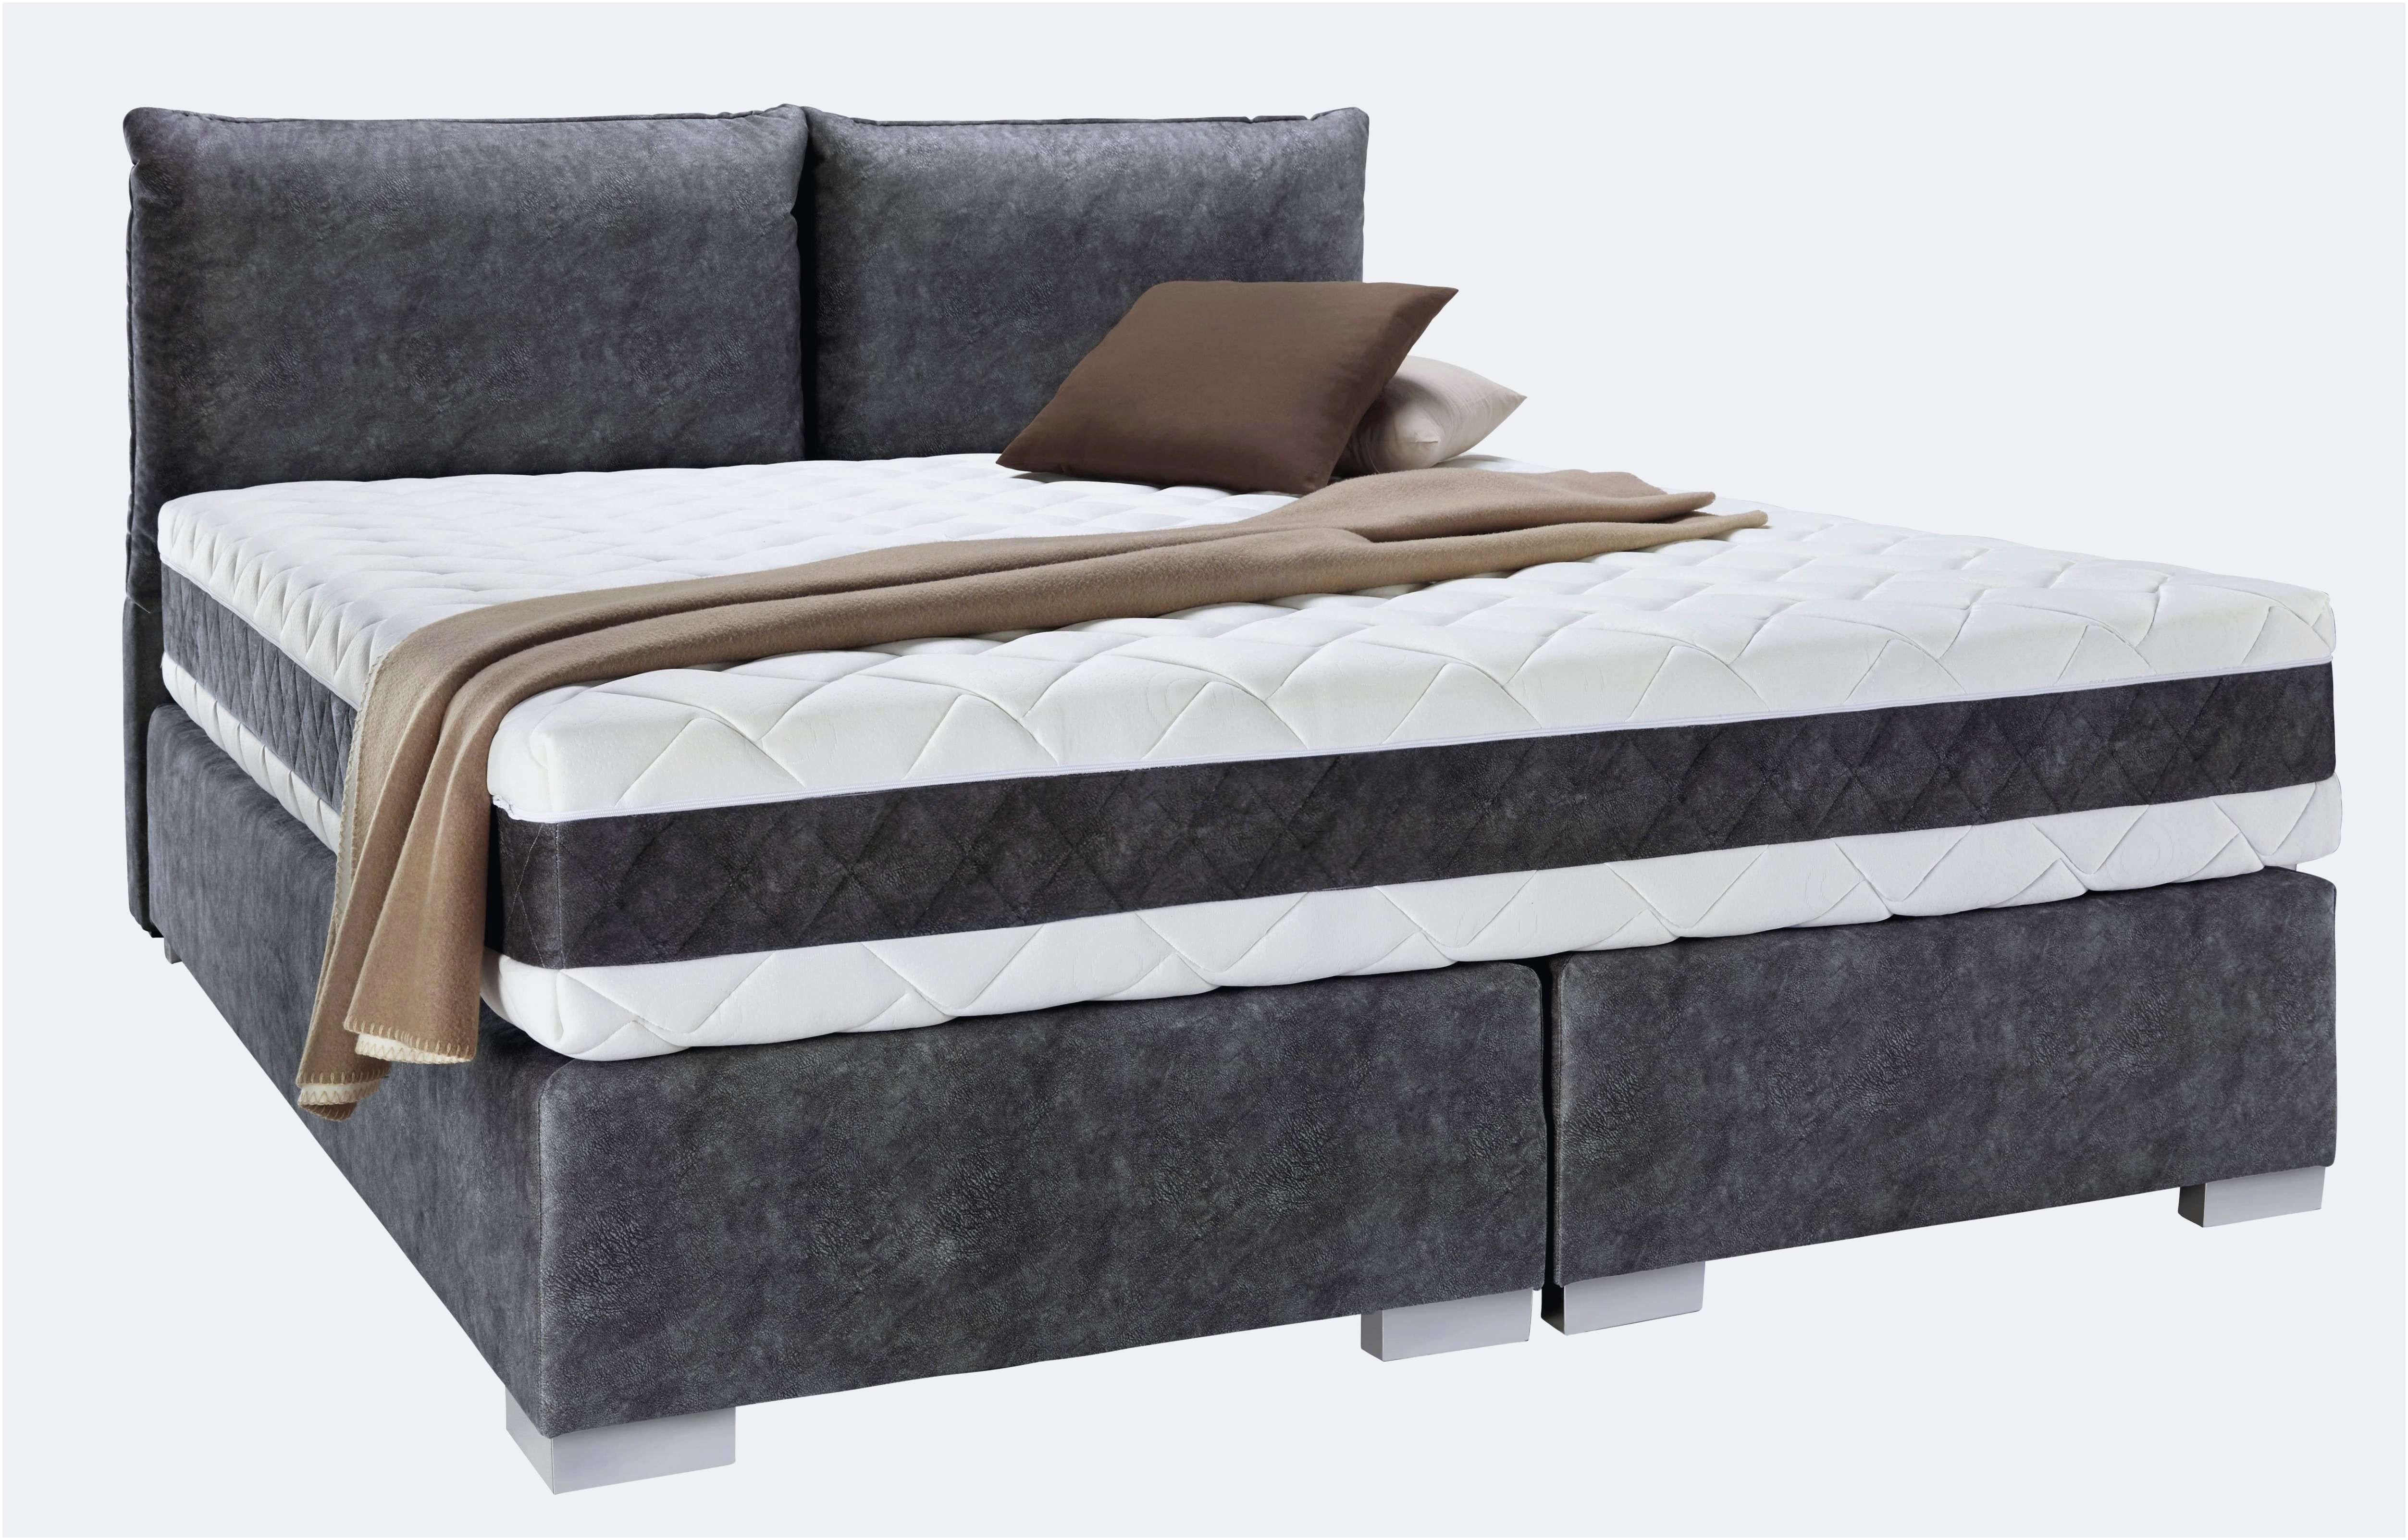 unique topper ikea elegant ikea matratzen topper ebenfalls tolle futon pour excellent futon ikea